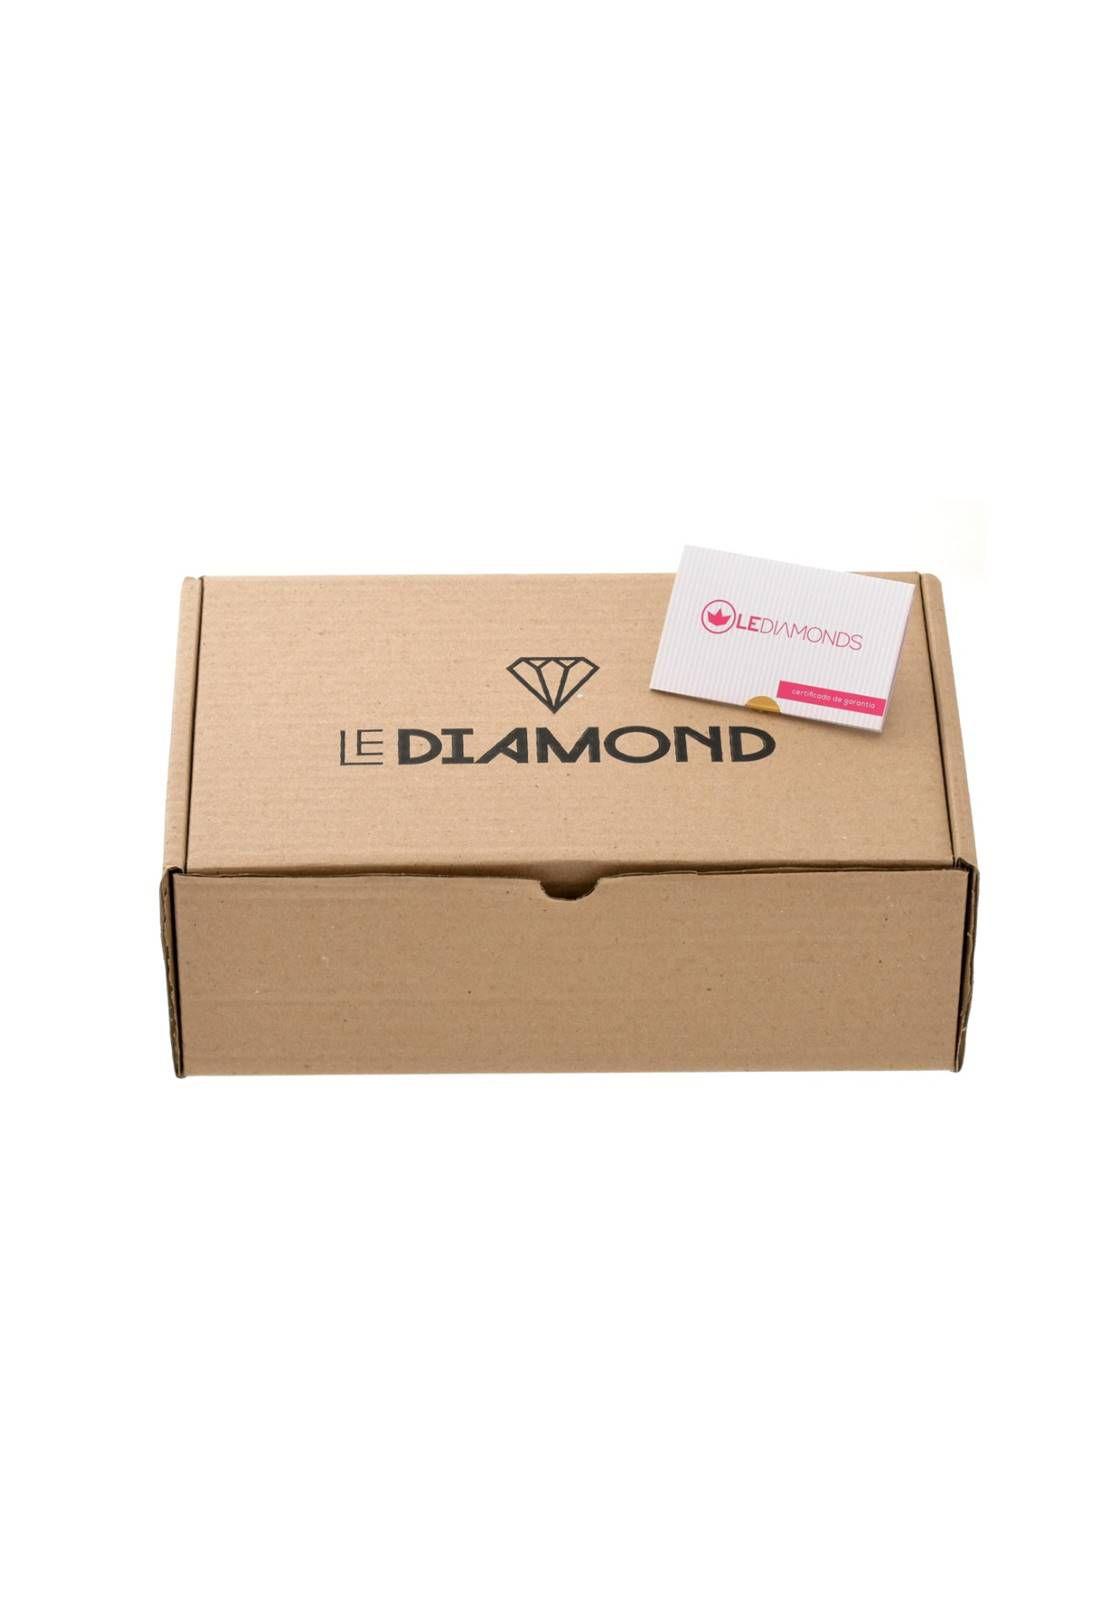 Brinco Argola Le Diamond Forma Geométrica Lilás